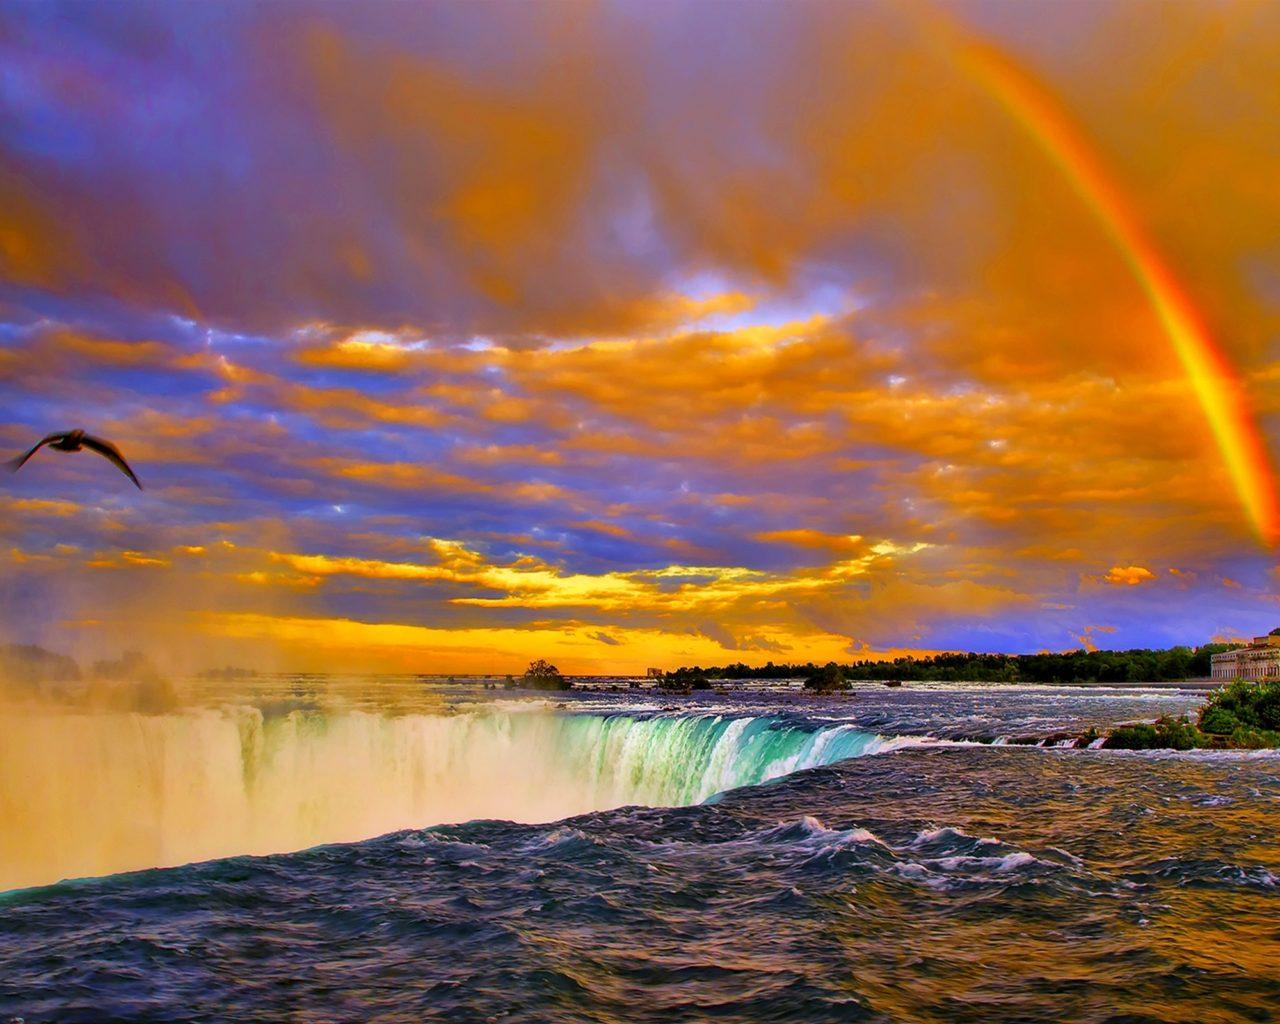 Niagara Falls Wallpaper Rainbow Sunset Over Niagara Falls Desktop Background